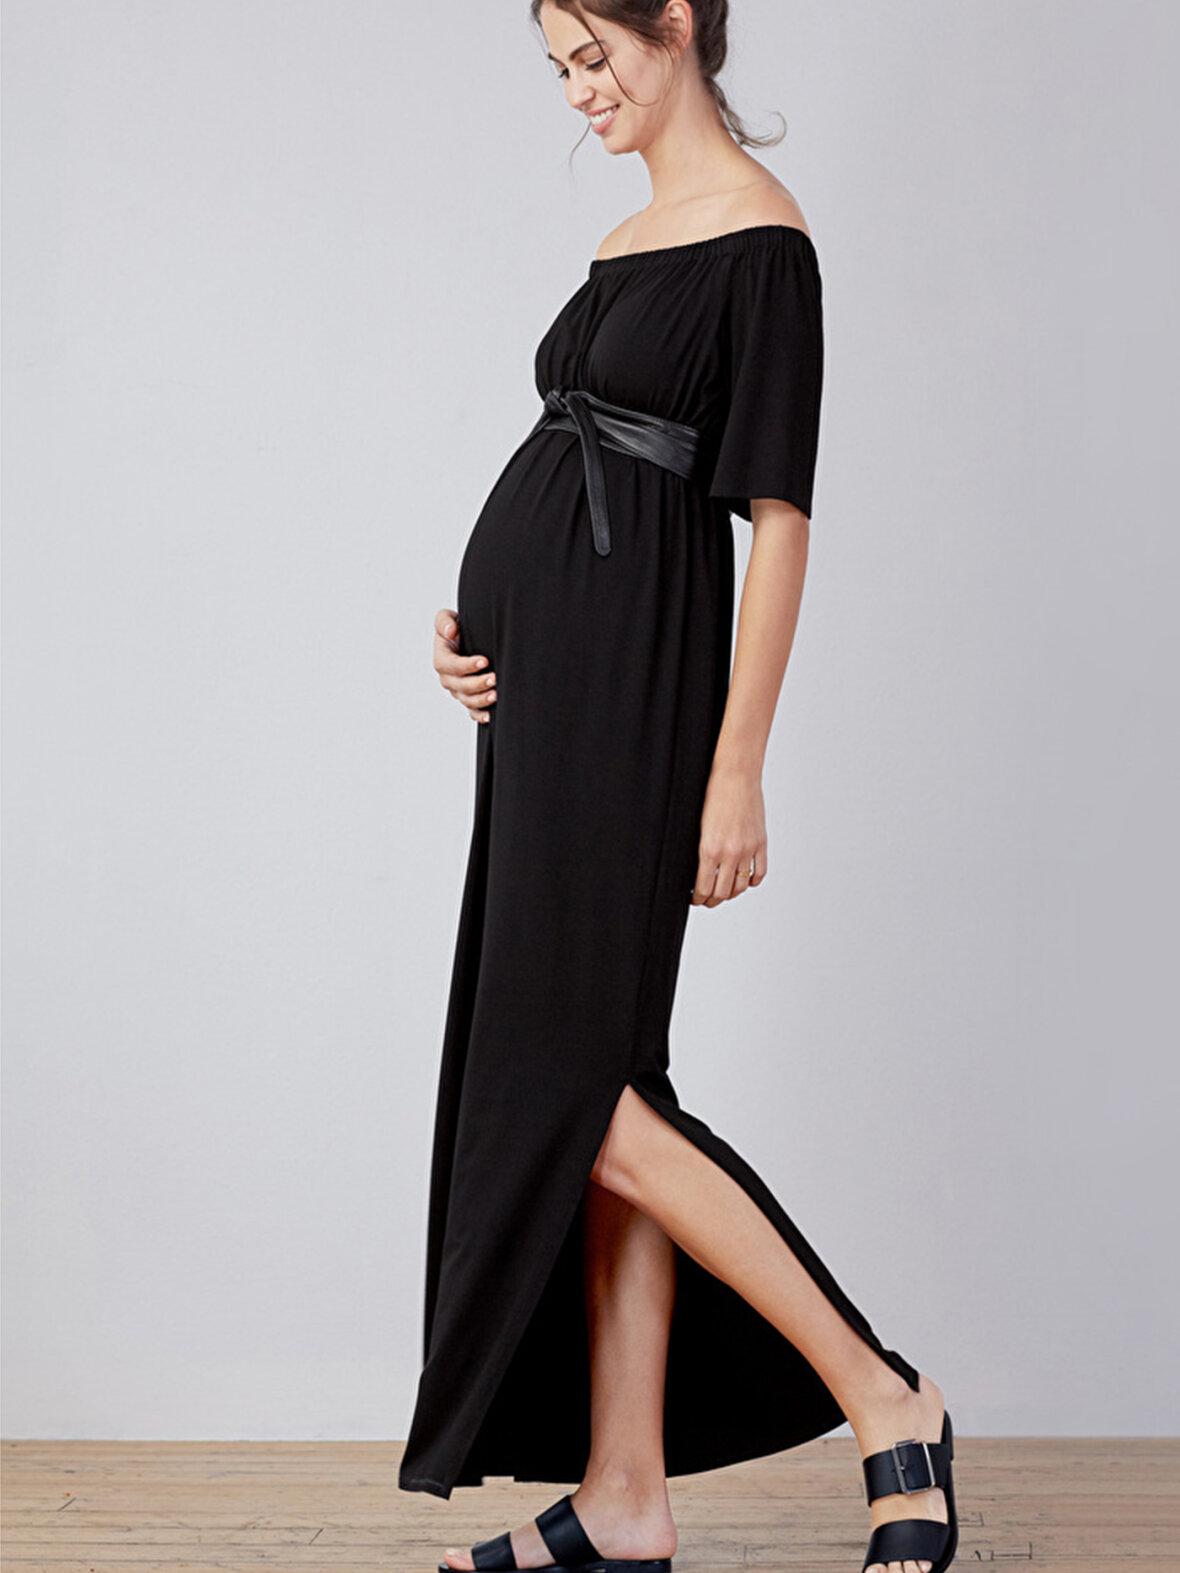 5a8944198e7a Unike Enula9 - Gravid kjoler - Isabella Oliver - Kari Maxi kjole JA-92